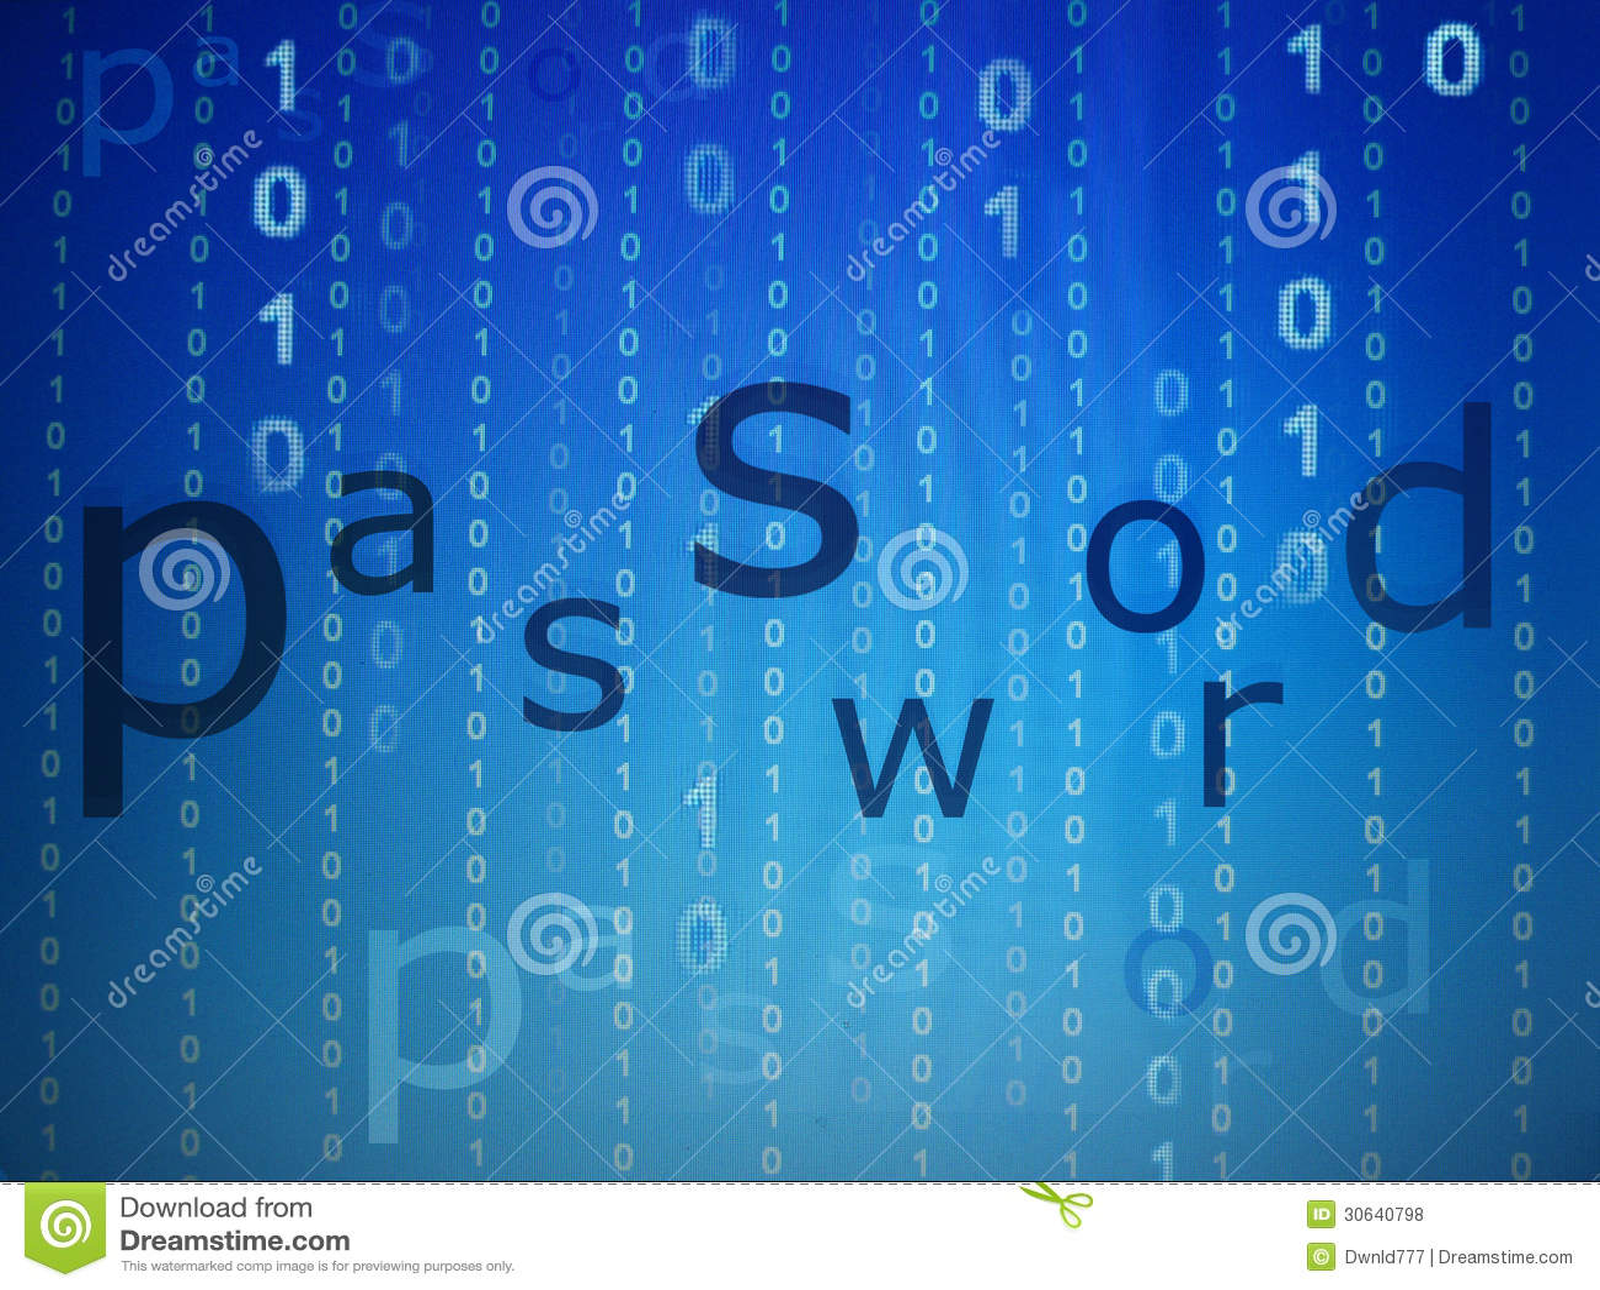 Passworton-line-Sicherheits-Konzeptblau